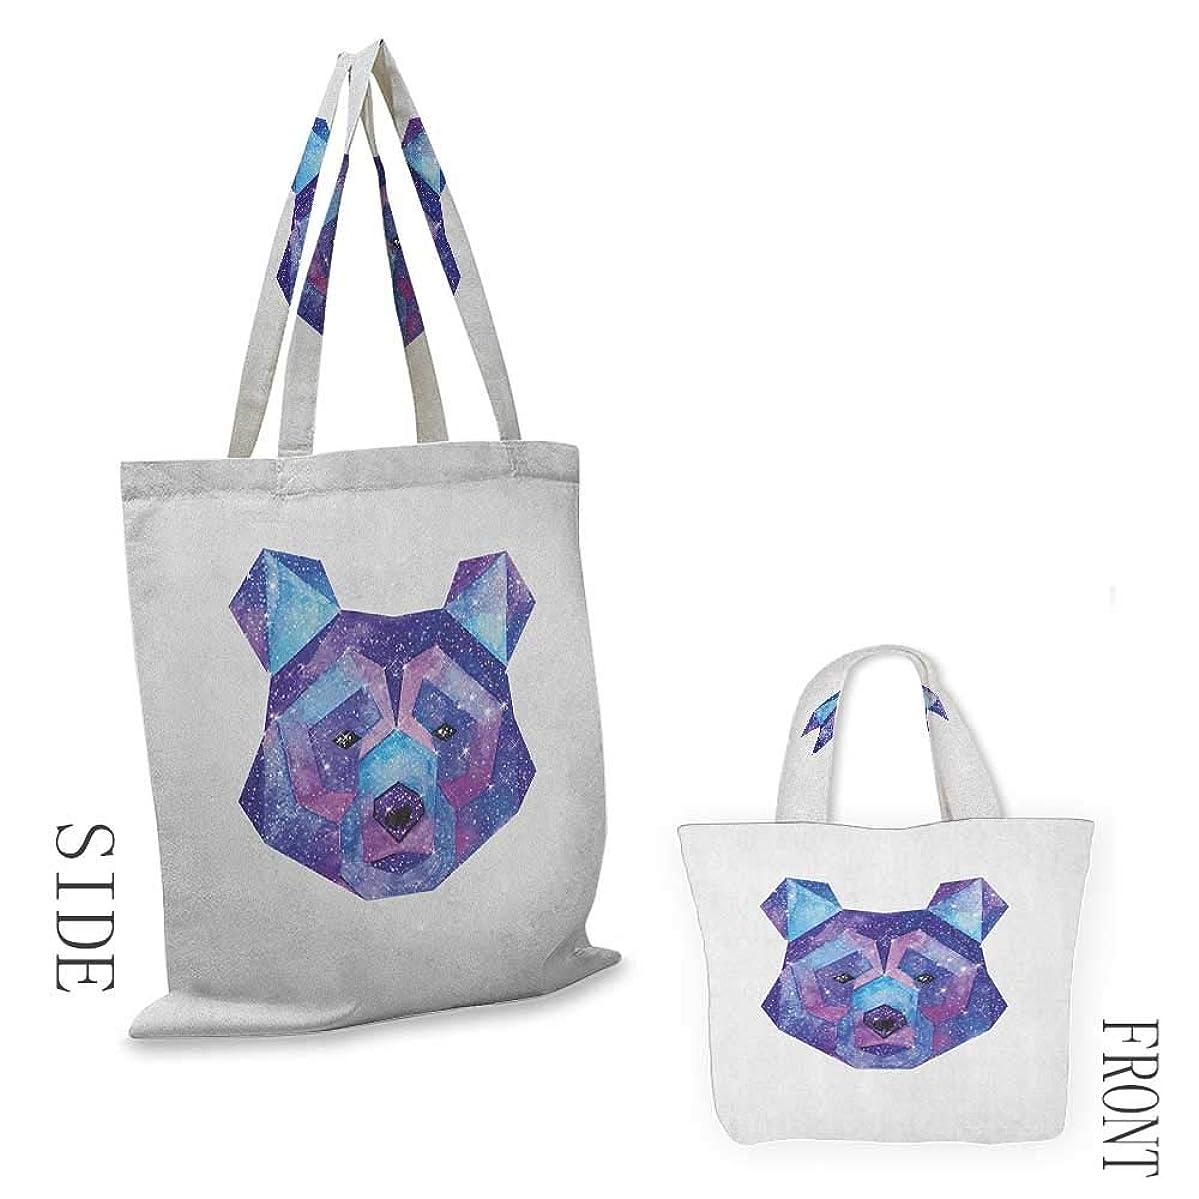 "shopping bag for women BearCosmic Polygonal Wildlife Figure Hand Drawn Watercolor Artwork with Galaxy Pattern Blue Magenta18""W x 16""H"